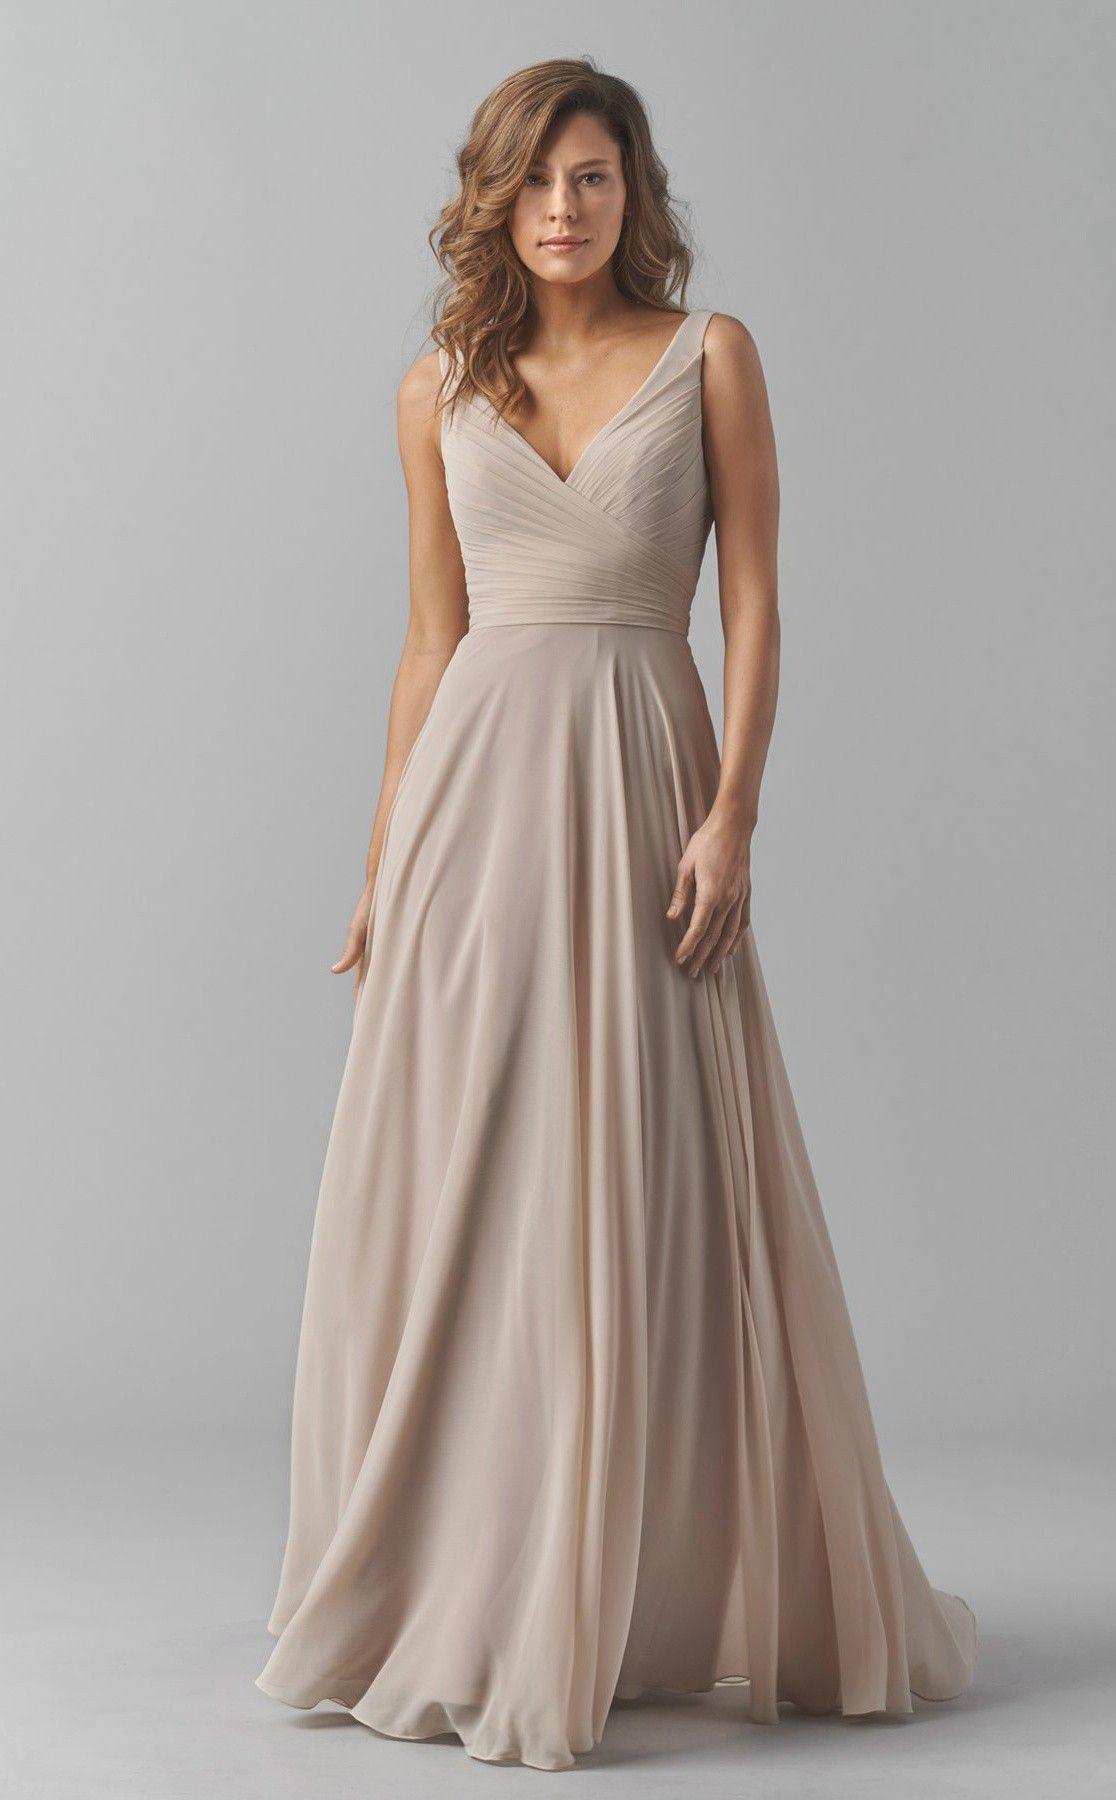 Chiffon Long Beige V Neck Bridesmaid Dress BDCA ball gowns